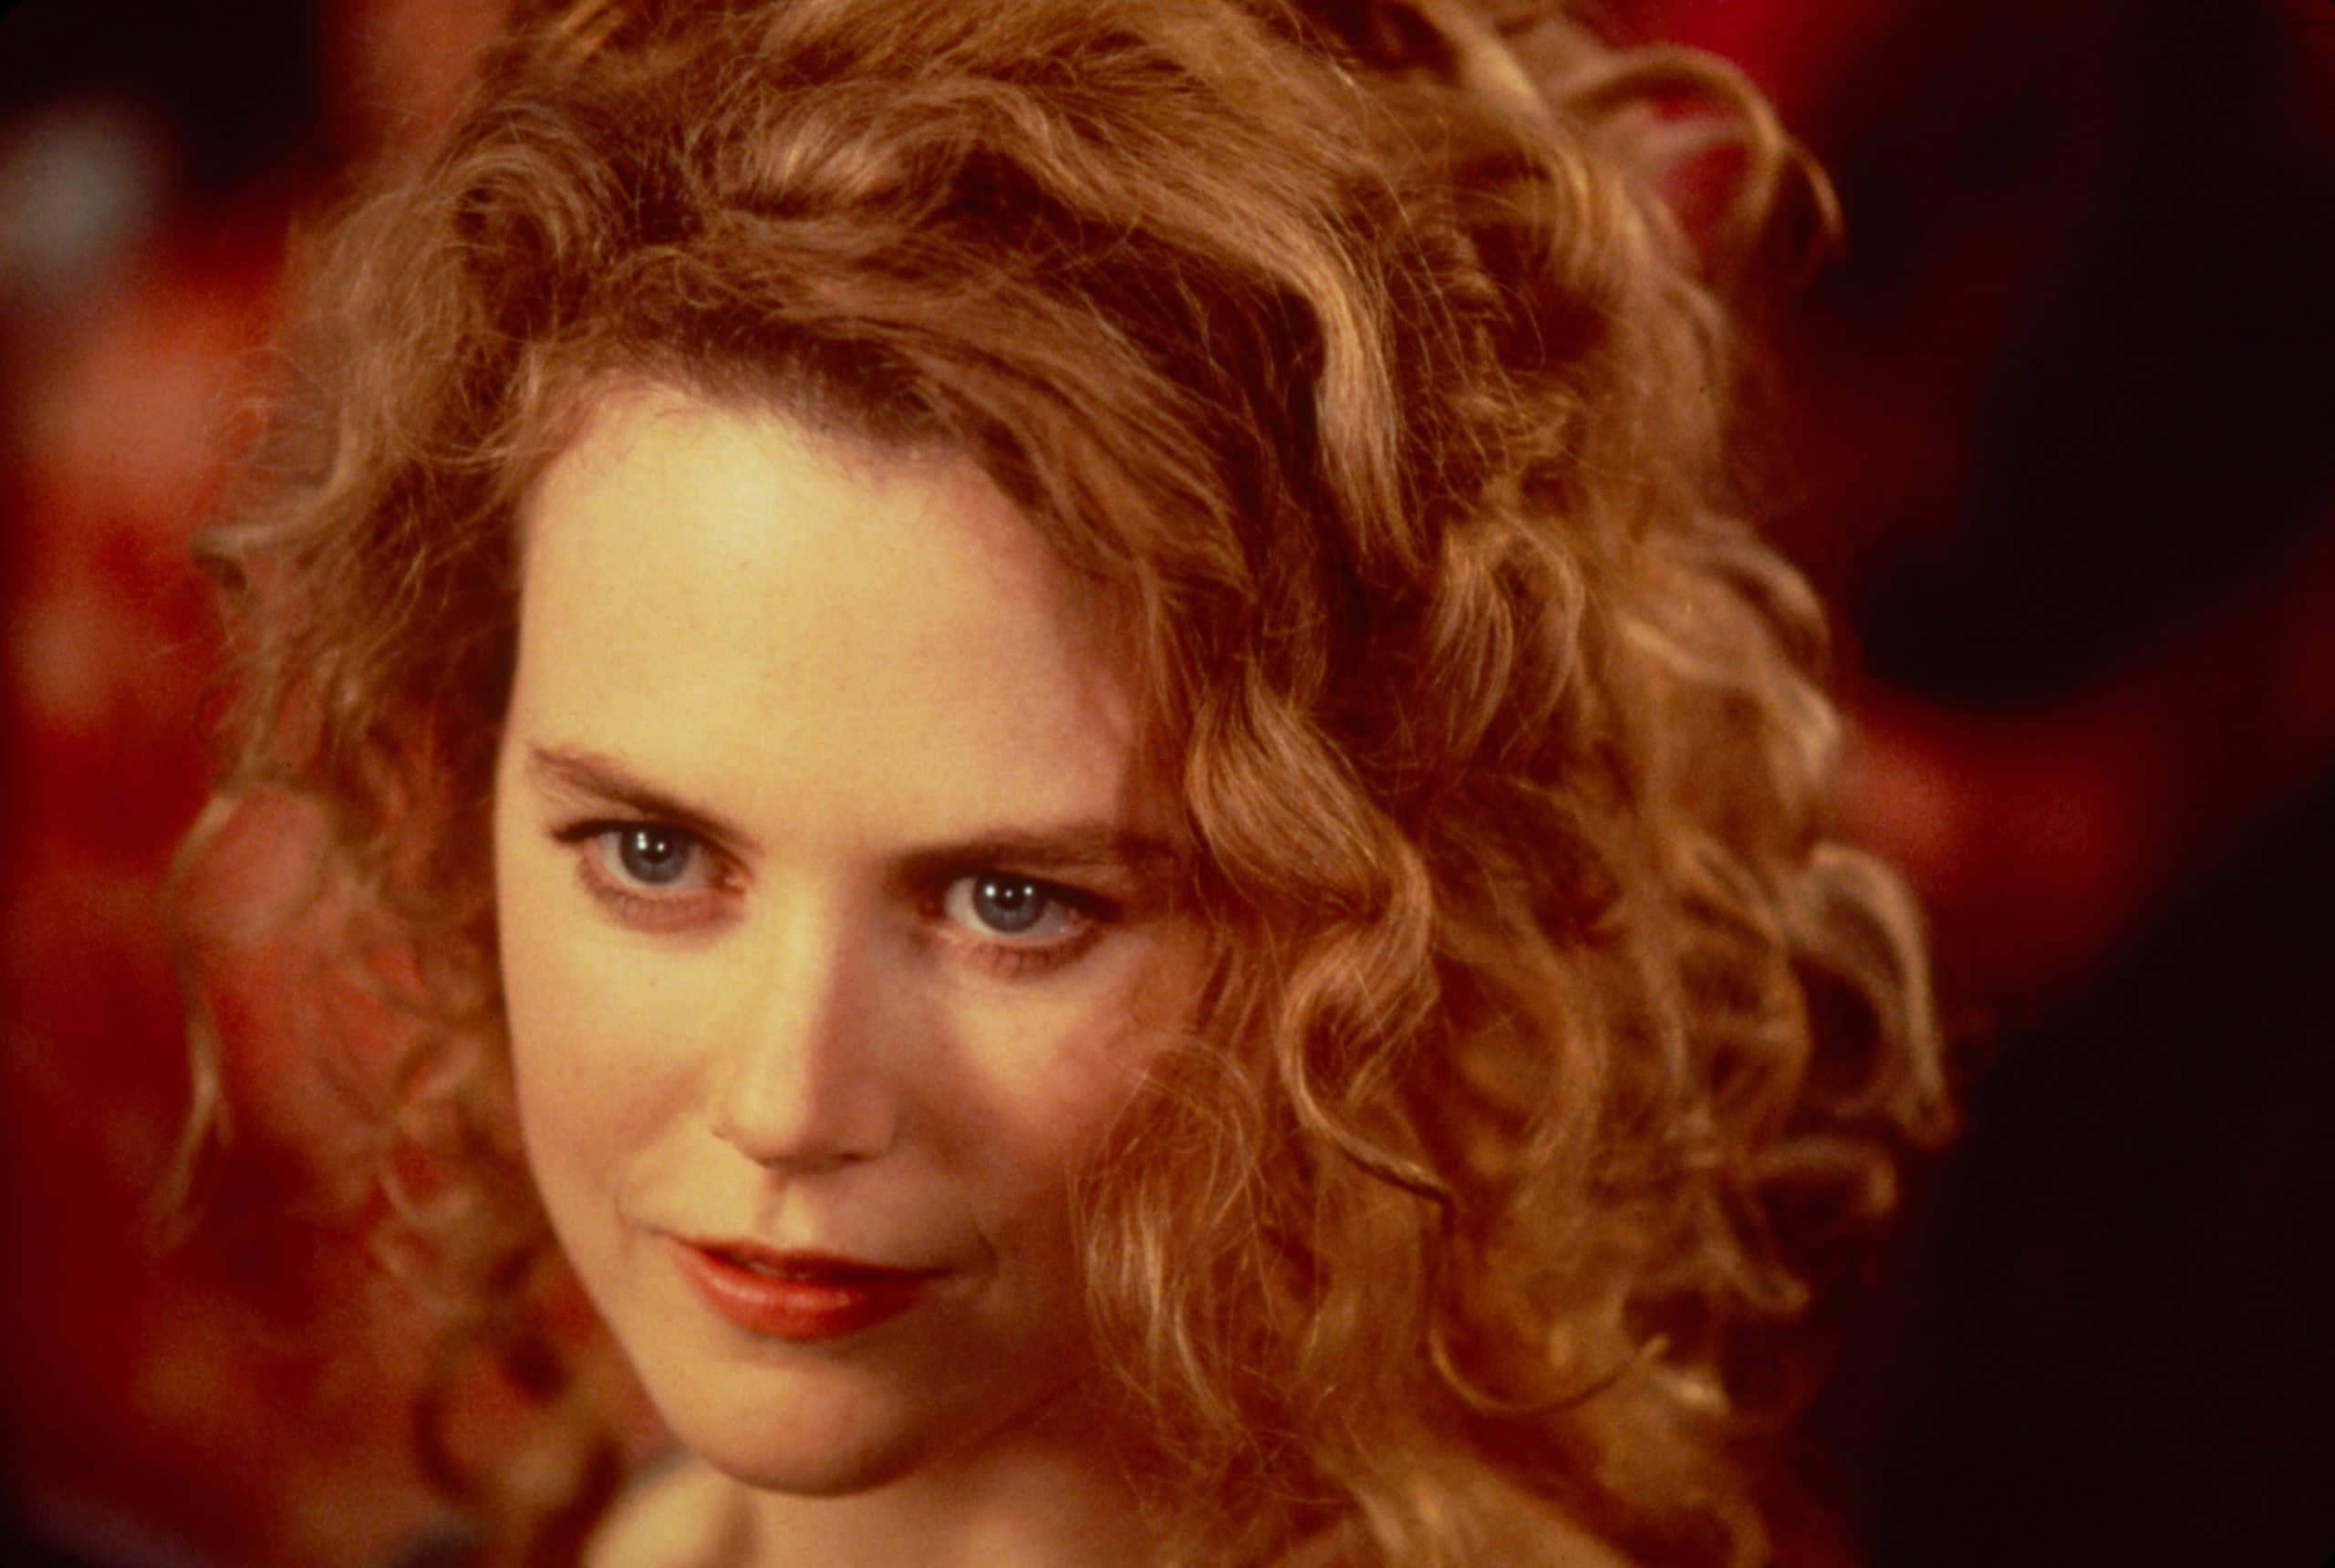 MY LIFE, from left: Nicole Kidman, 1993